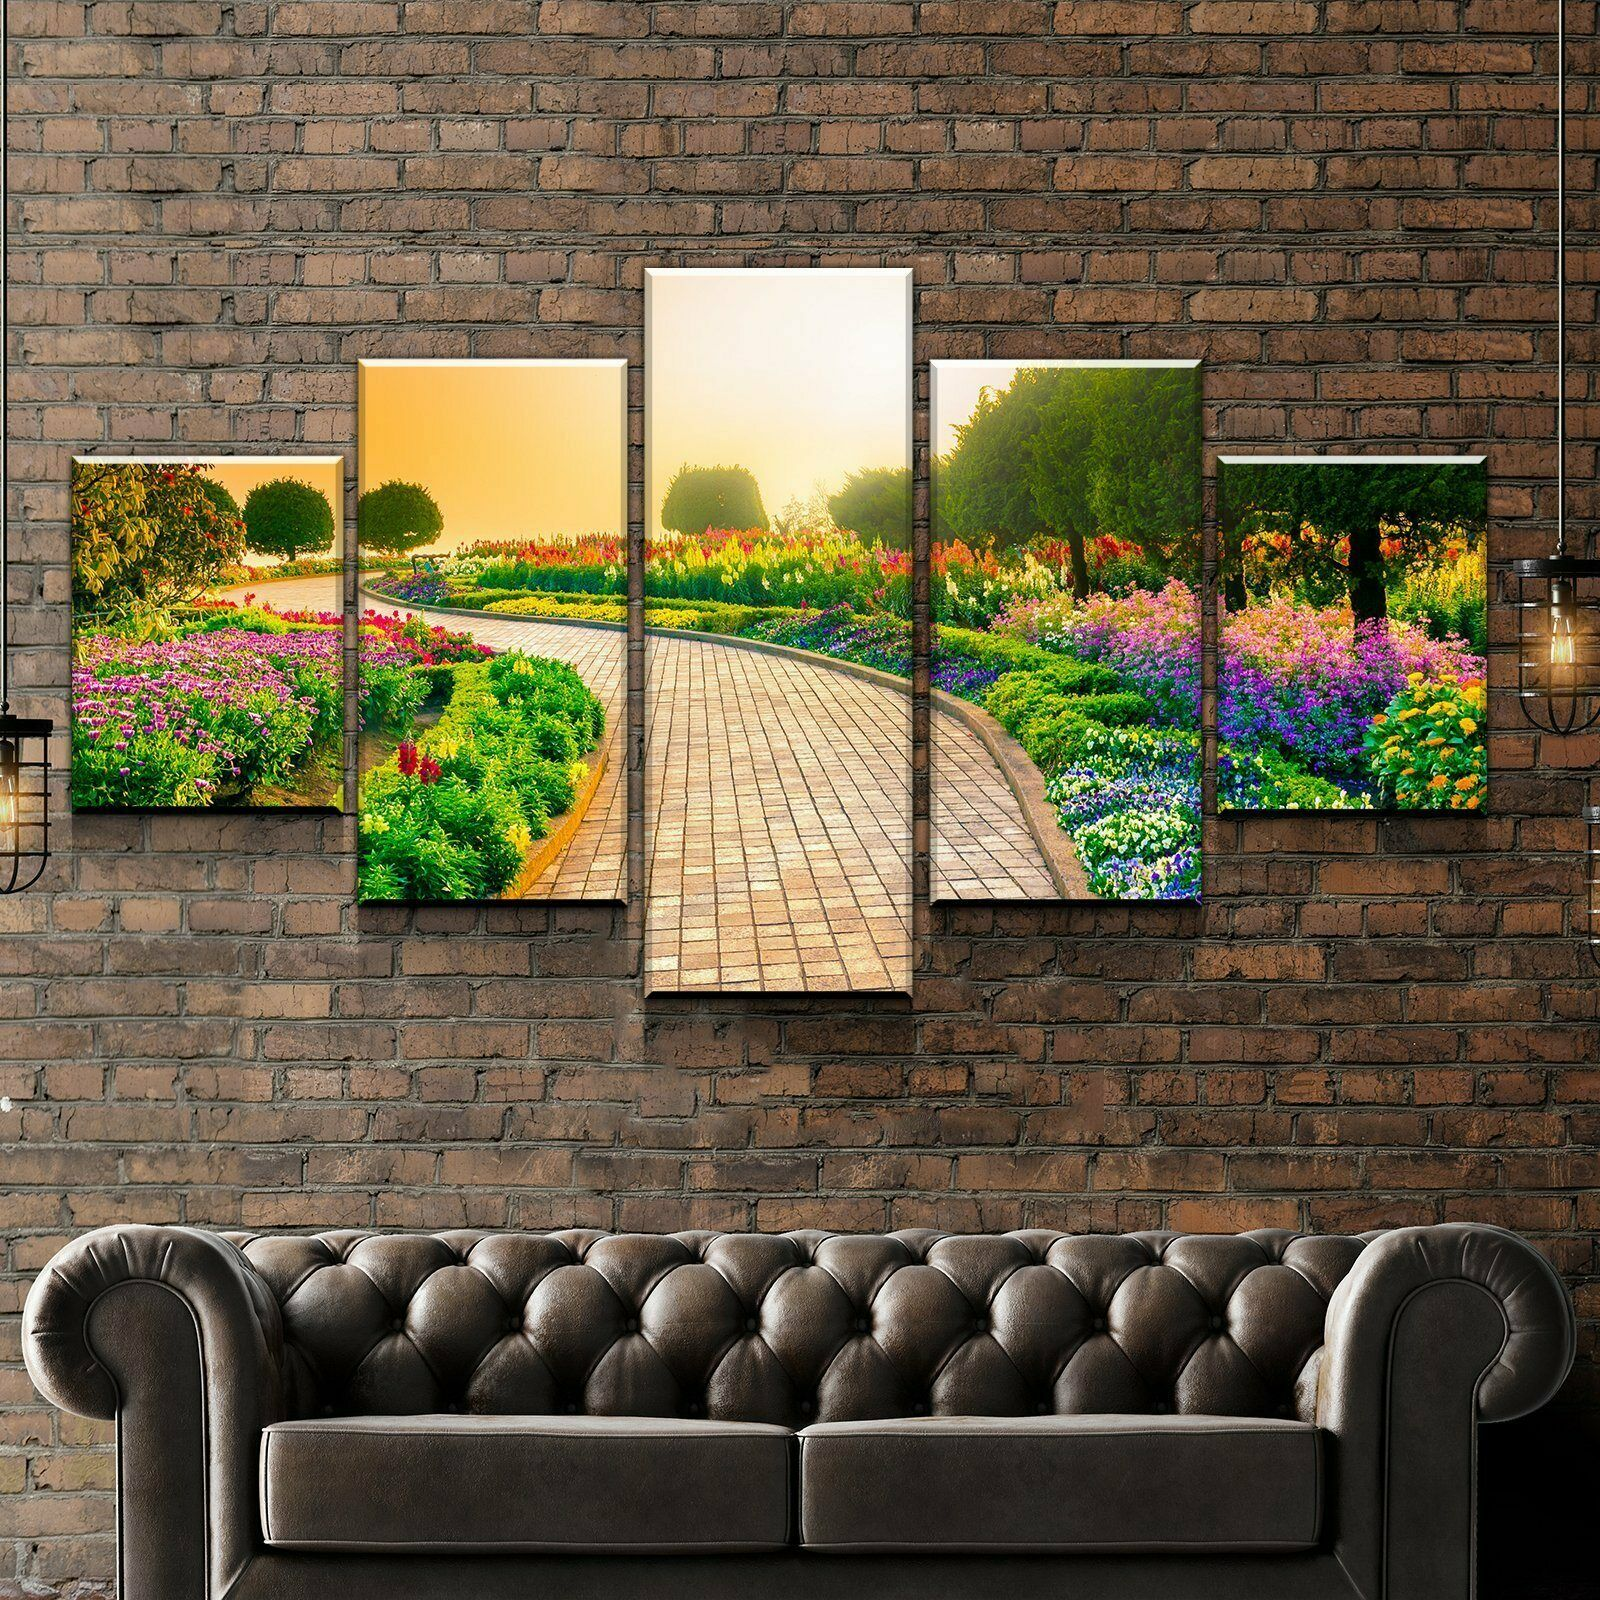 Garden Walkway Tree Flower 5 panel canvas Wall Art Home Decor Poster Print